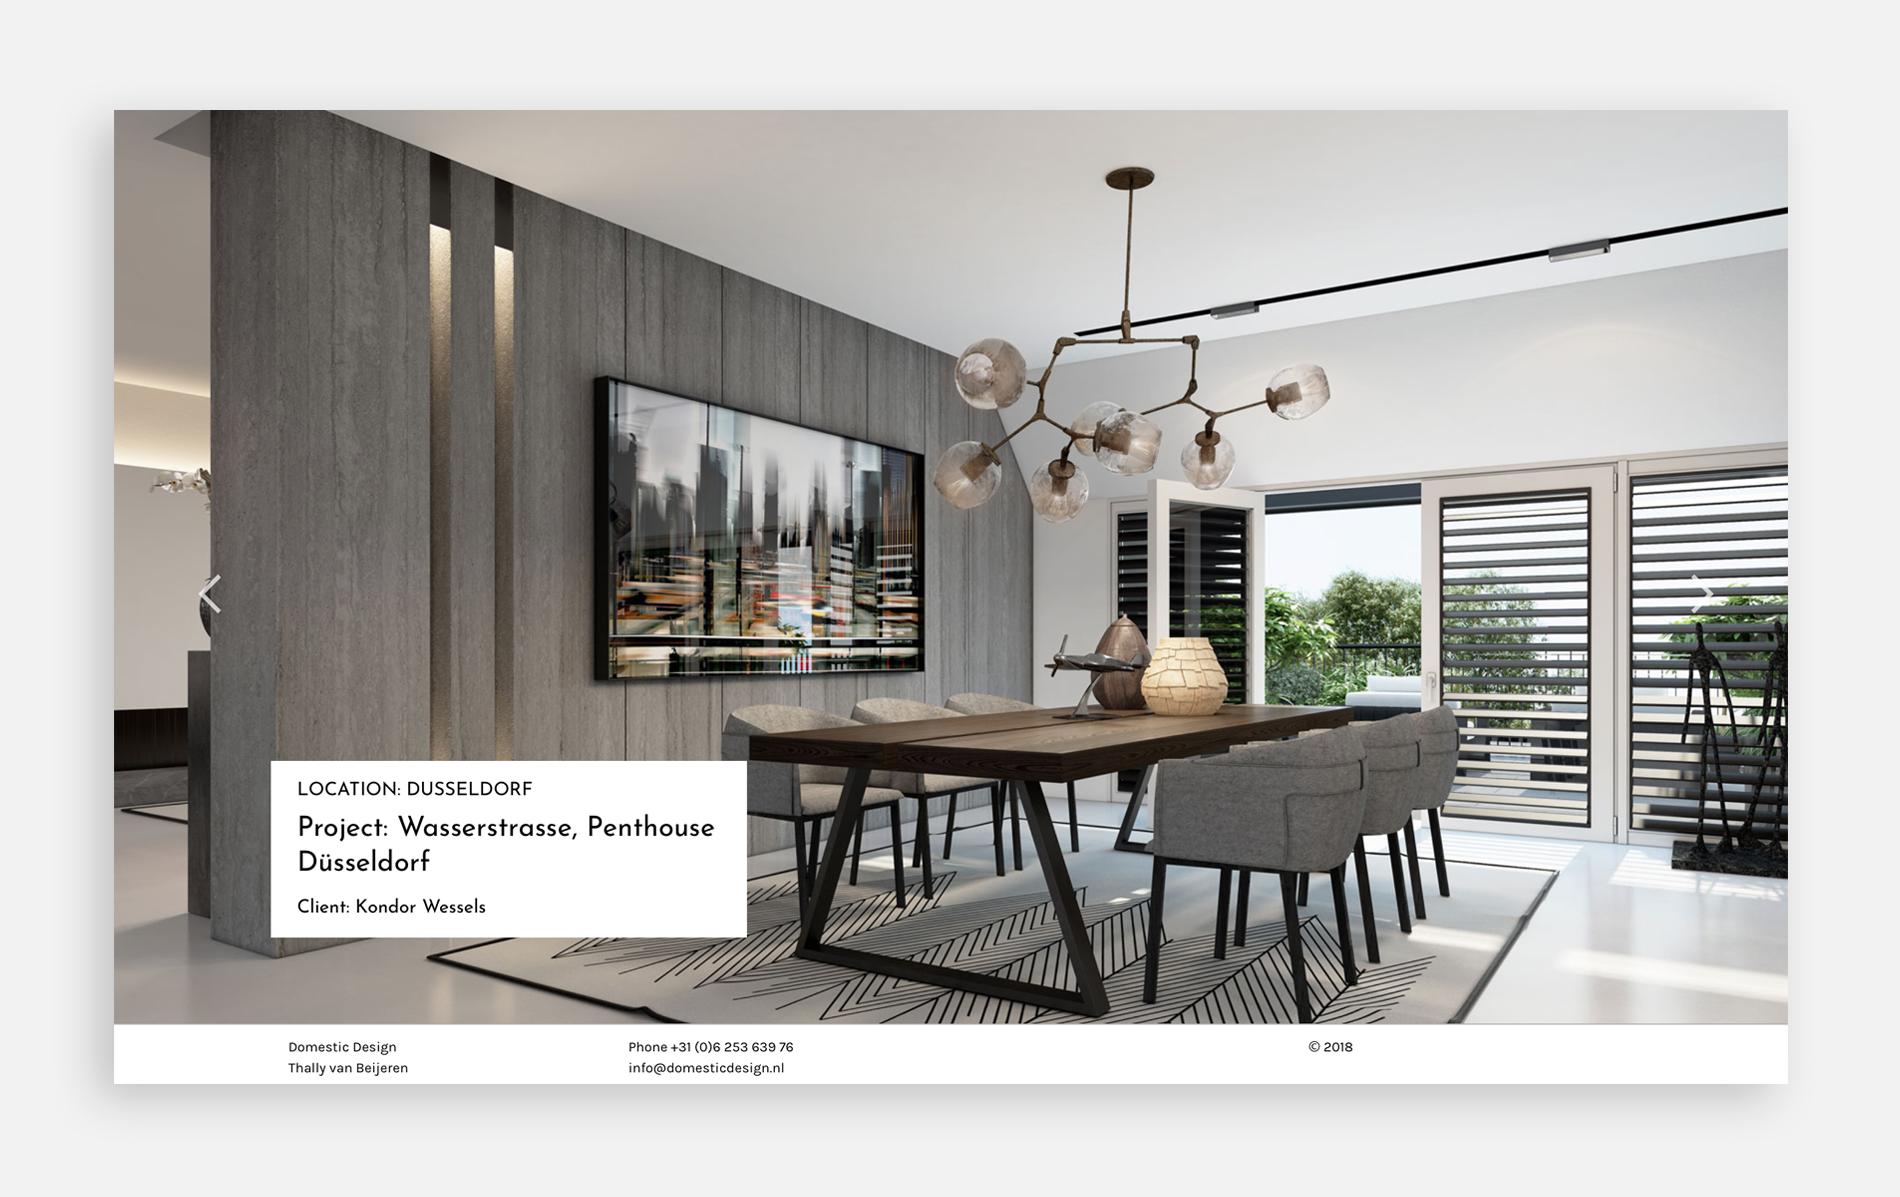 Anouk-Stoffels-Domestic-Design-Website-Slider